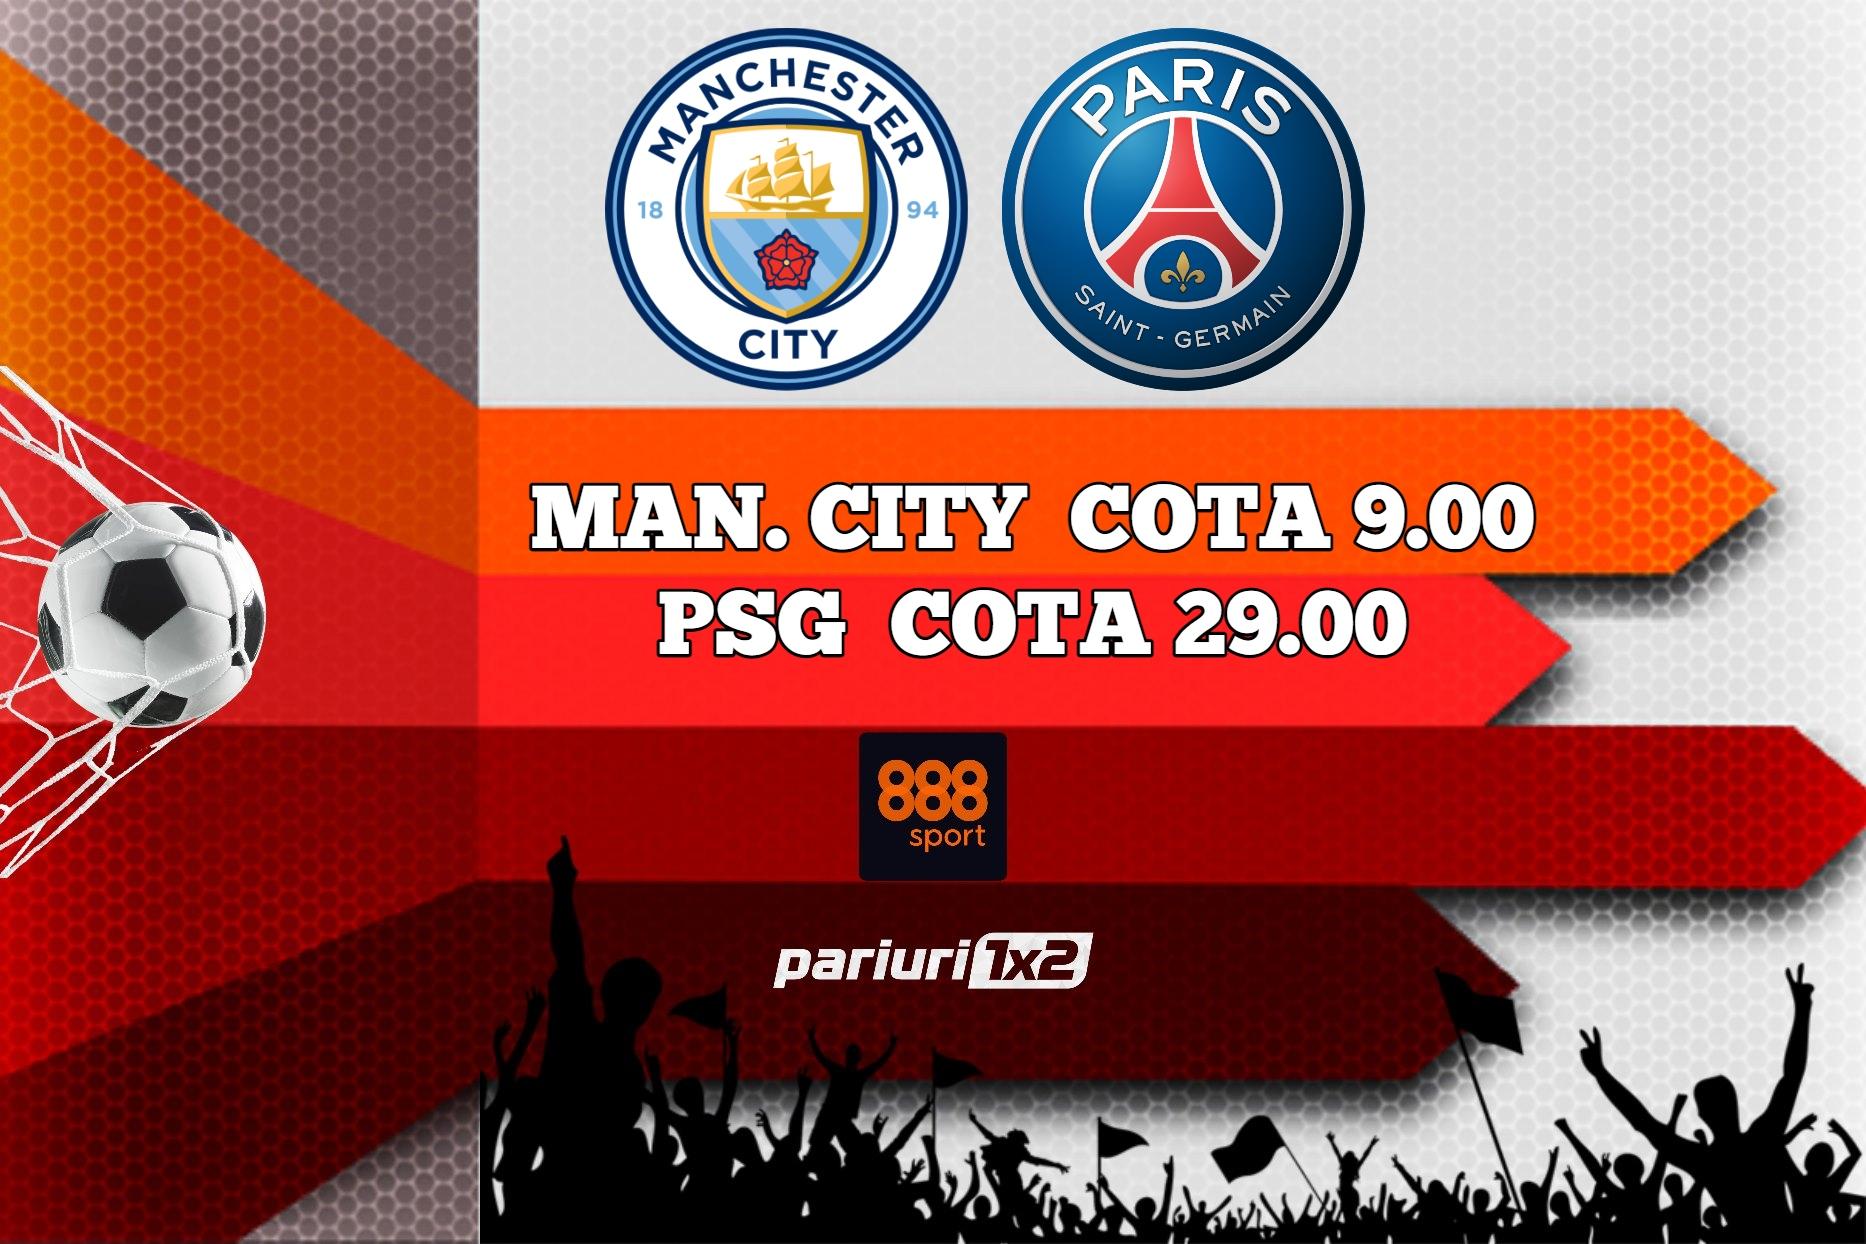 Man. City - PSG